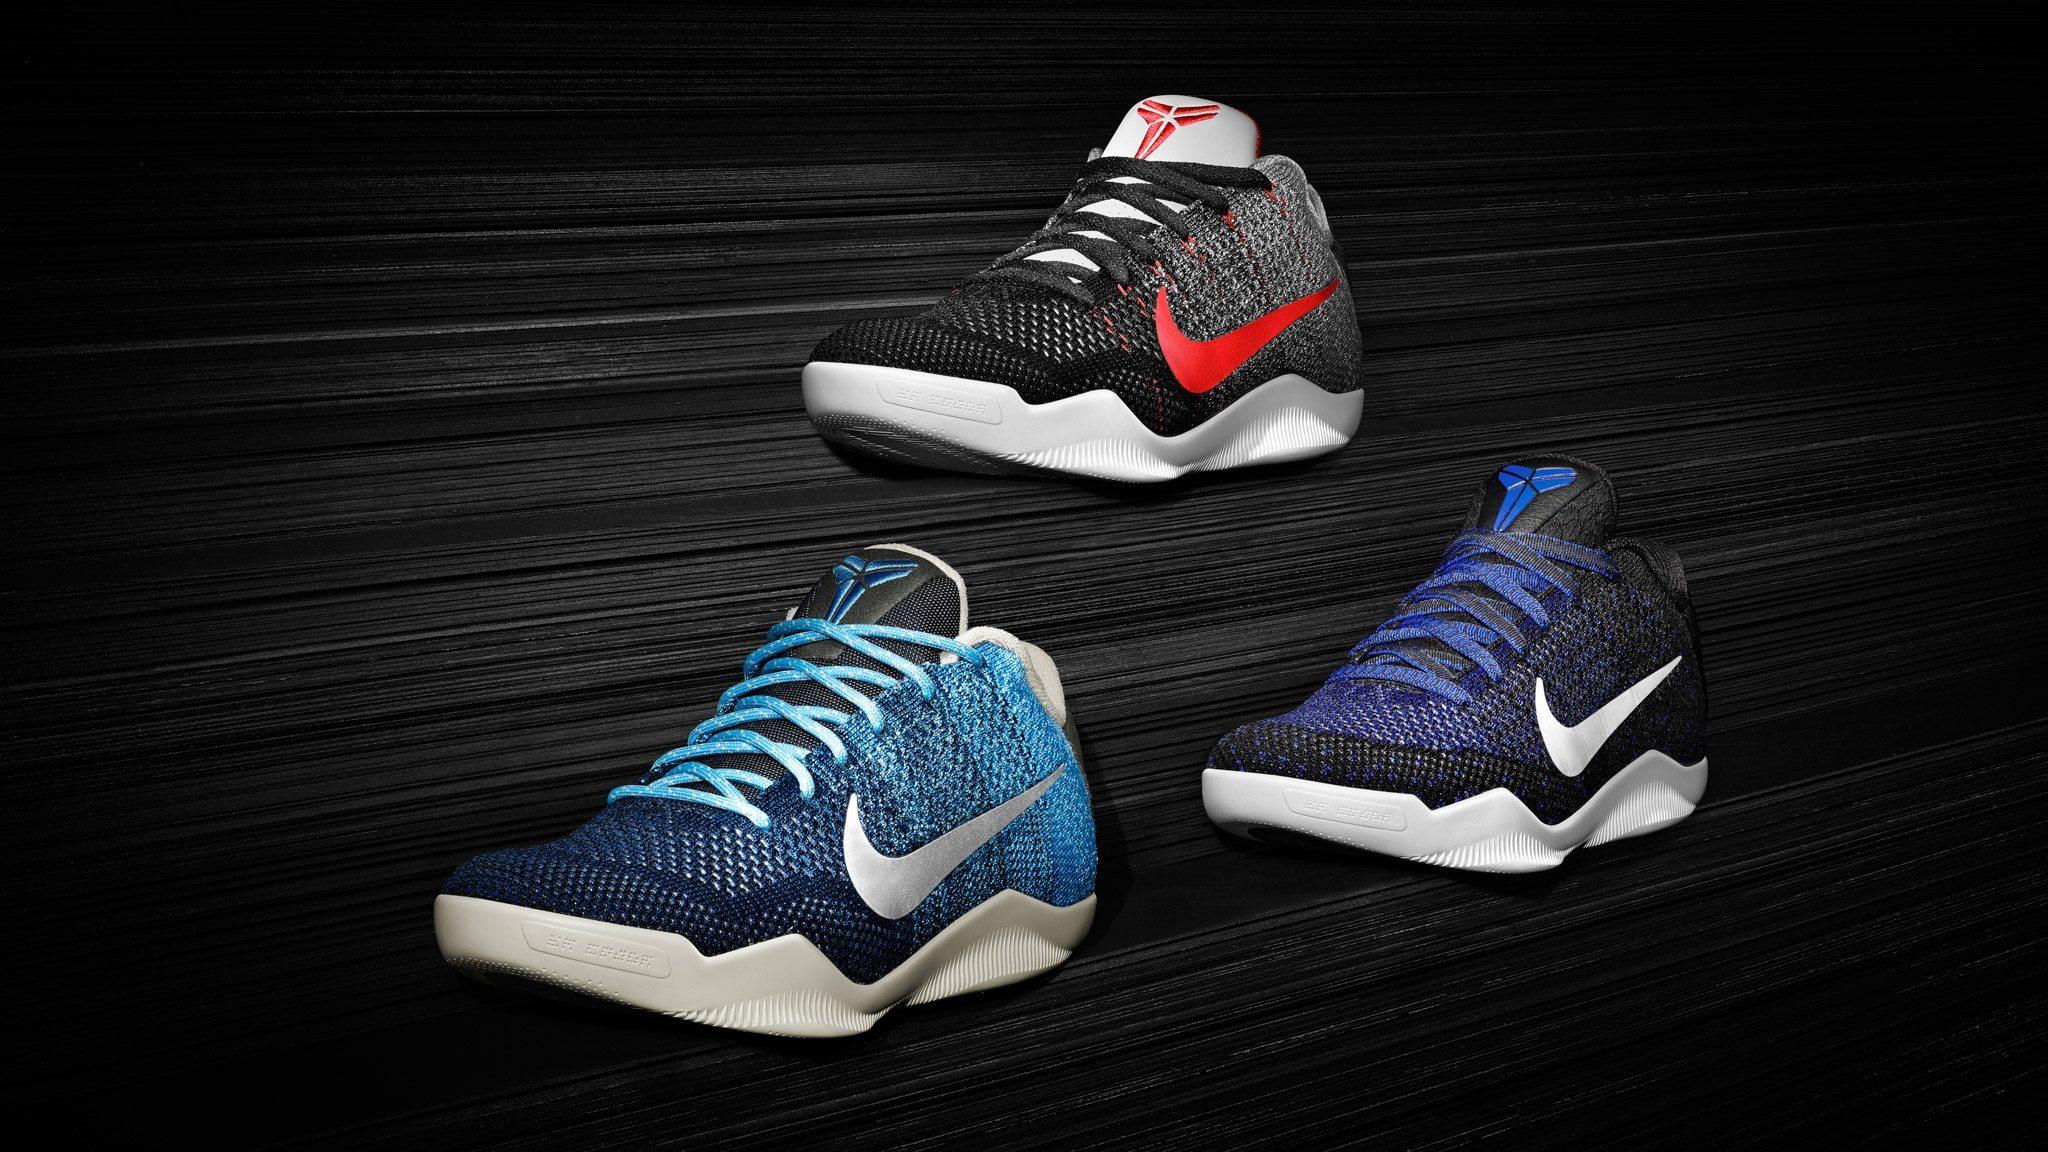 Nike Kobe 11 Muse Pack 1